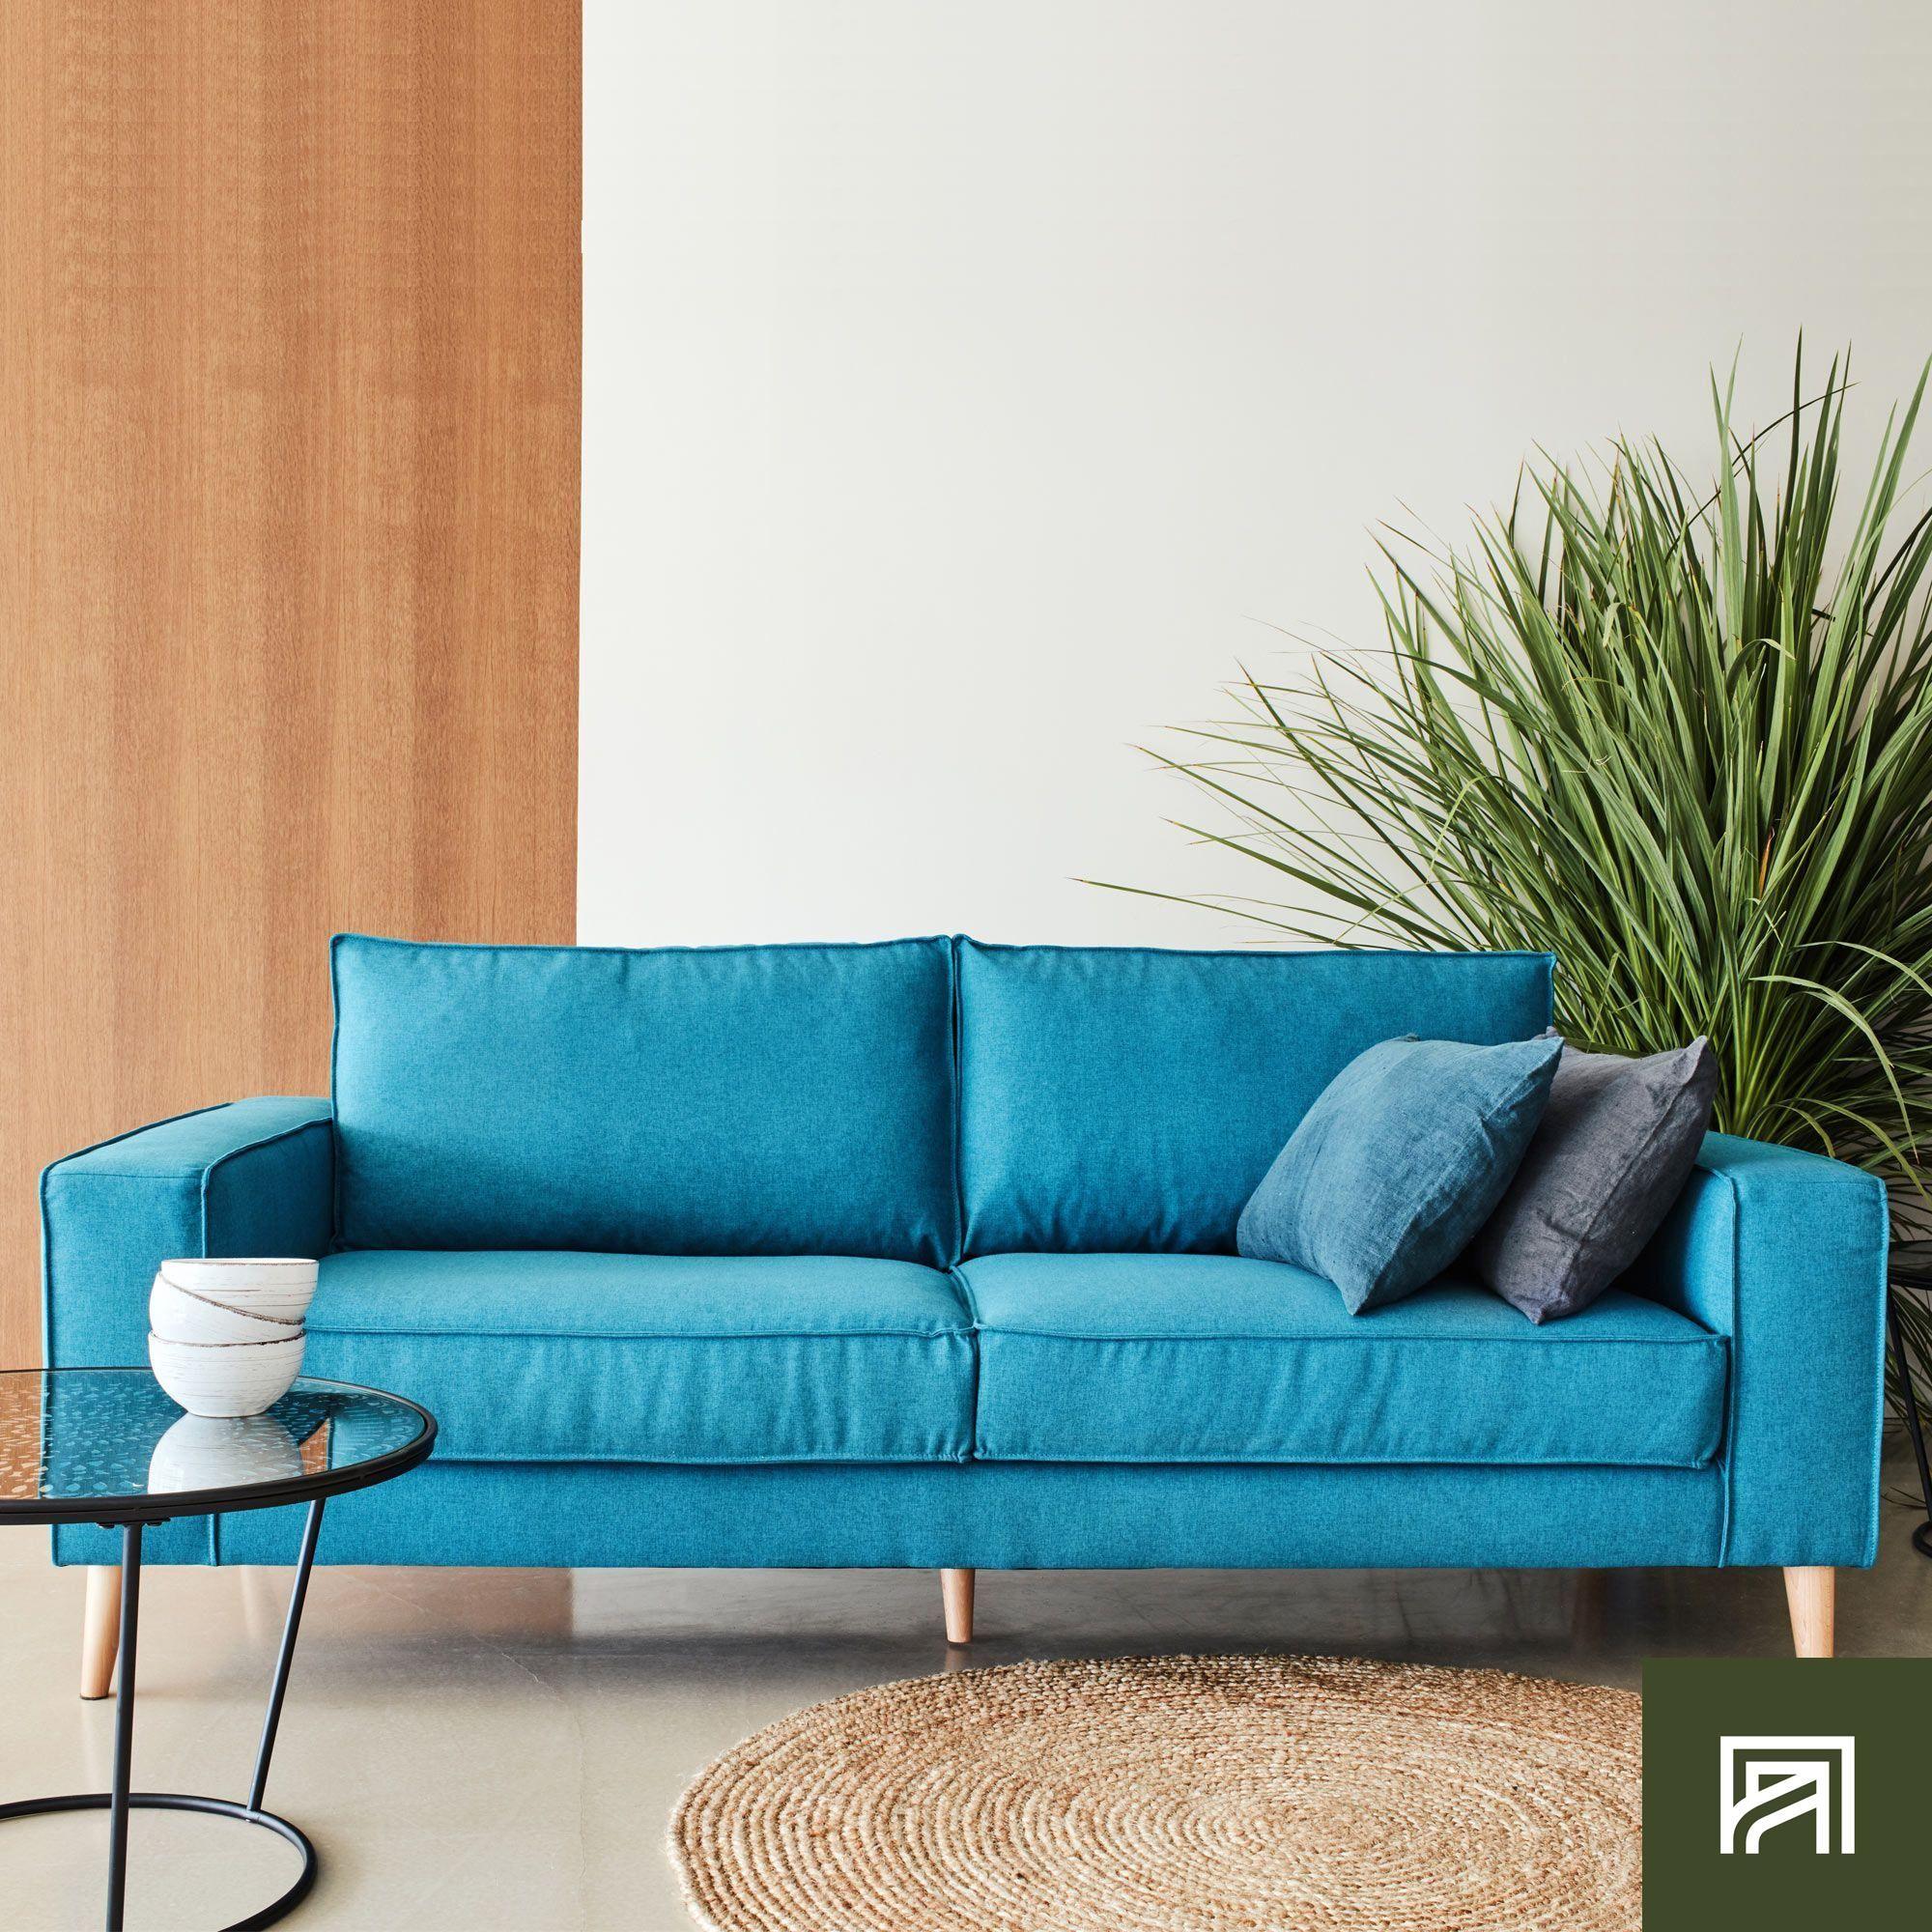 Fauteuil Lit Convertible Alinea alinea : california canapé 3 places fixe en tissu bleu